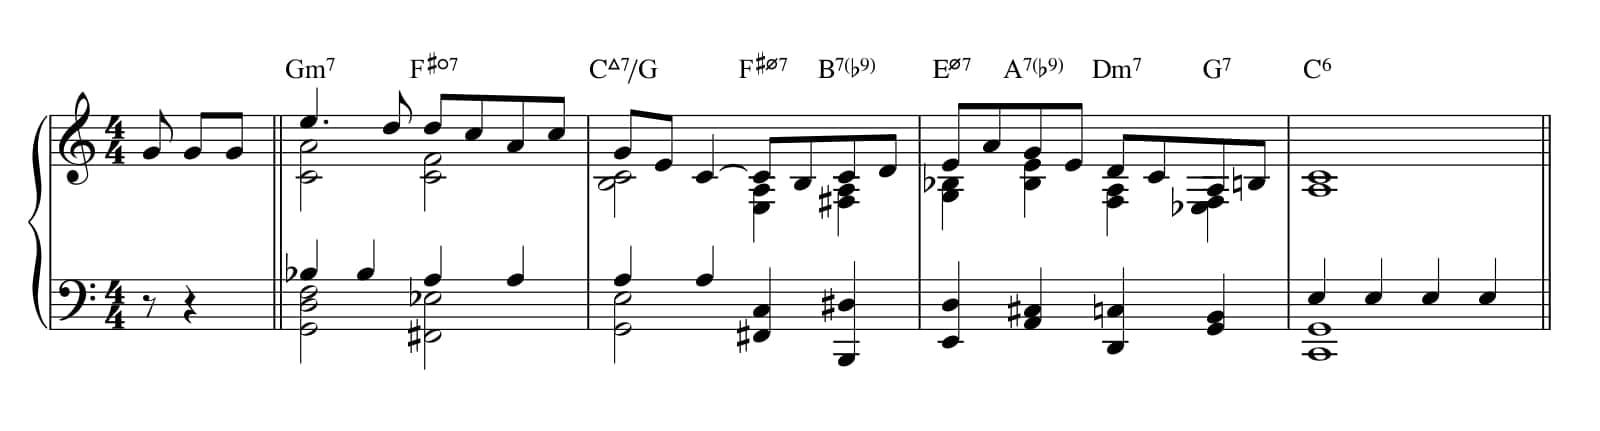 Repeated quarter note ballad